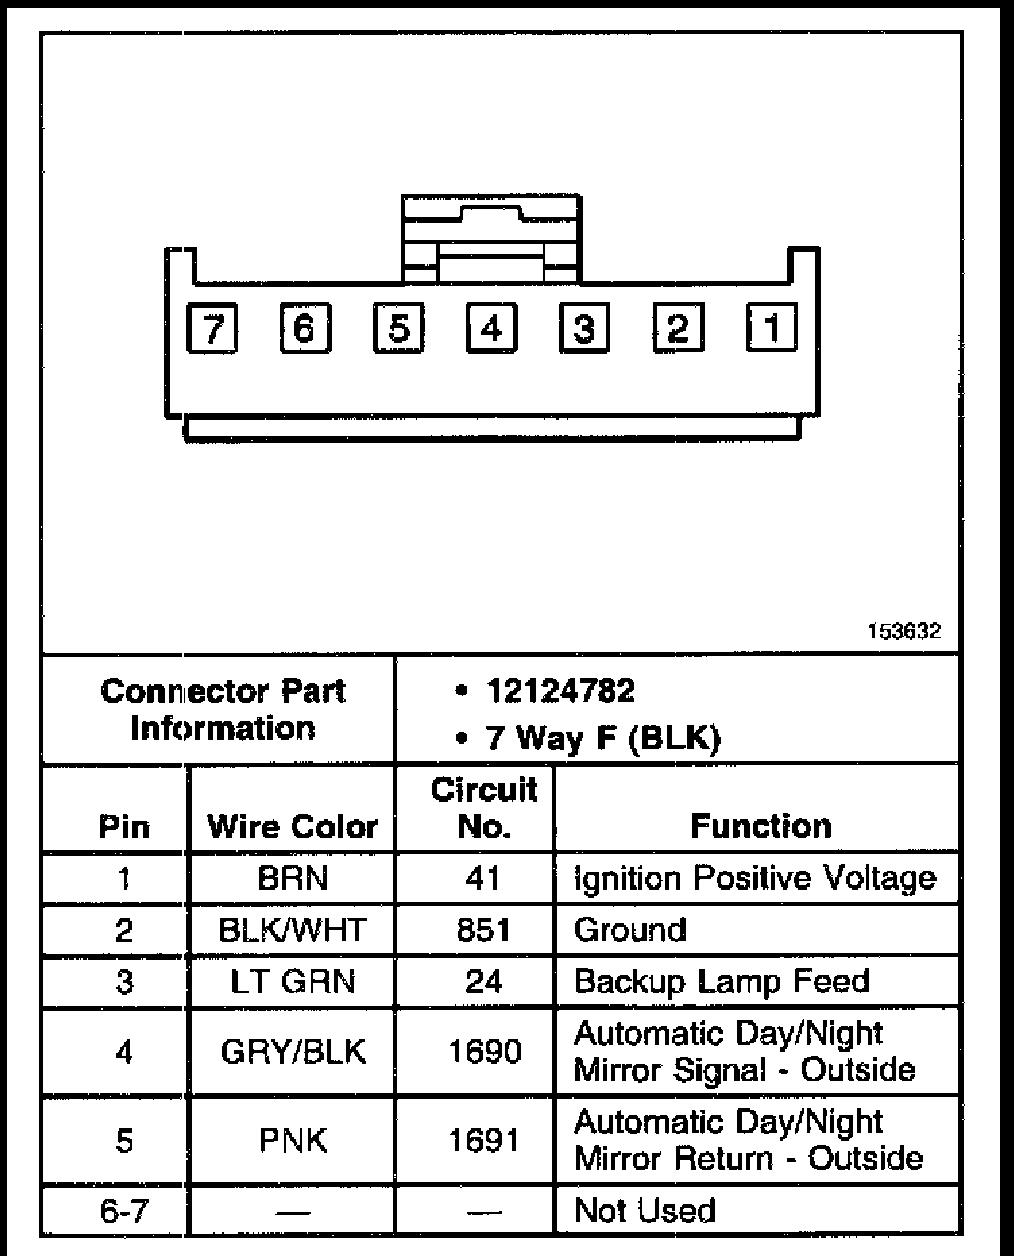 Outstanding Gentex 511 Wiring Diagram Wiring Diagram G9 Wiring Cloud Mousmenurrecoveryedborg